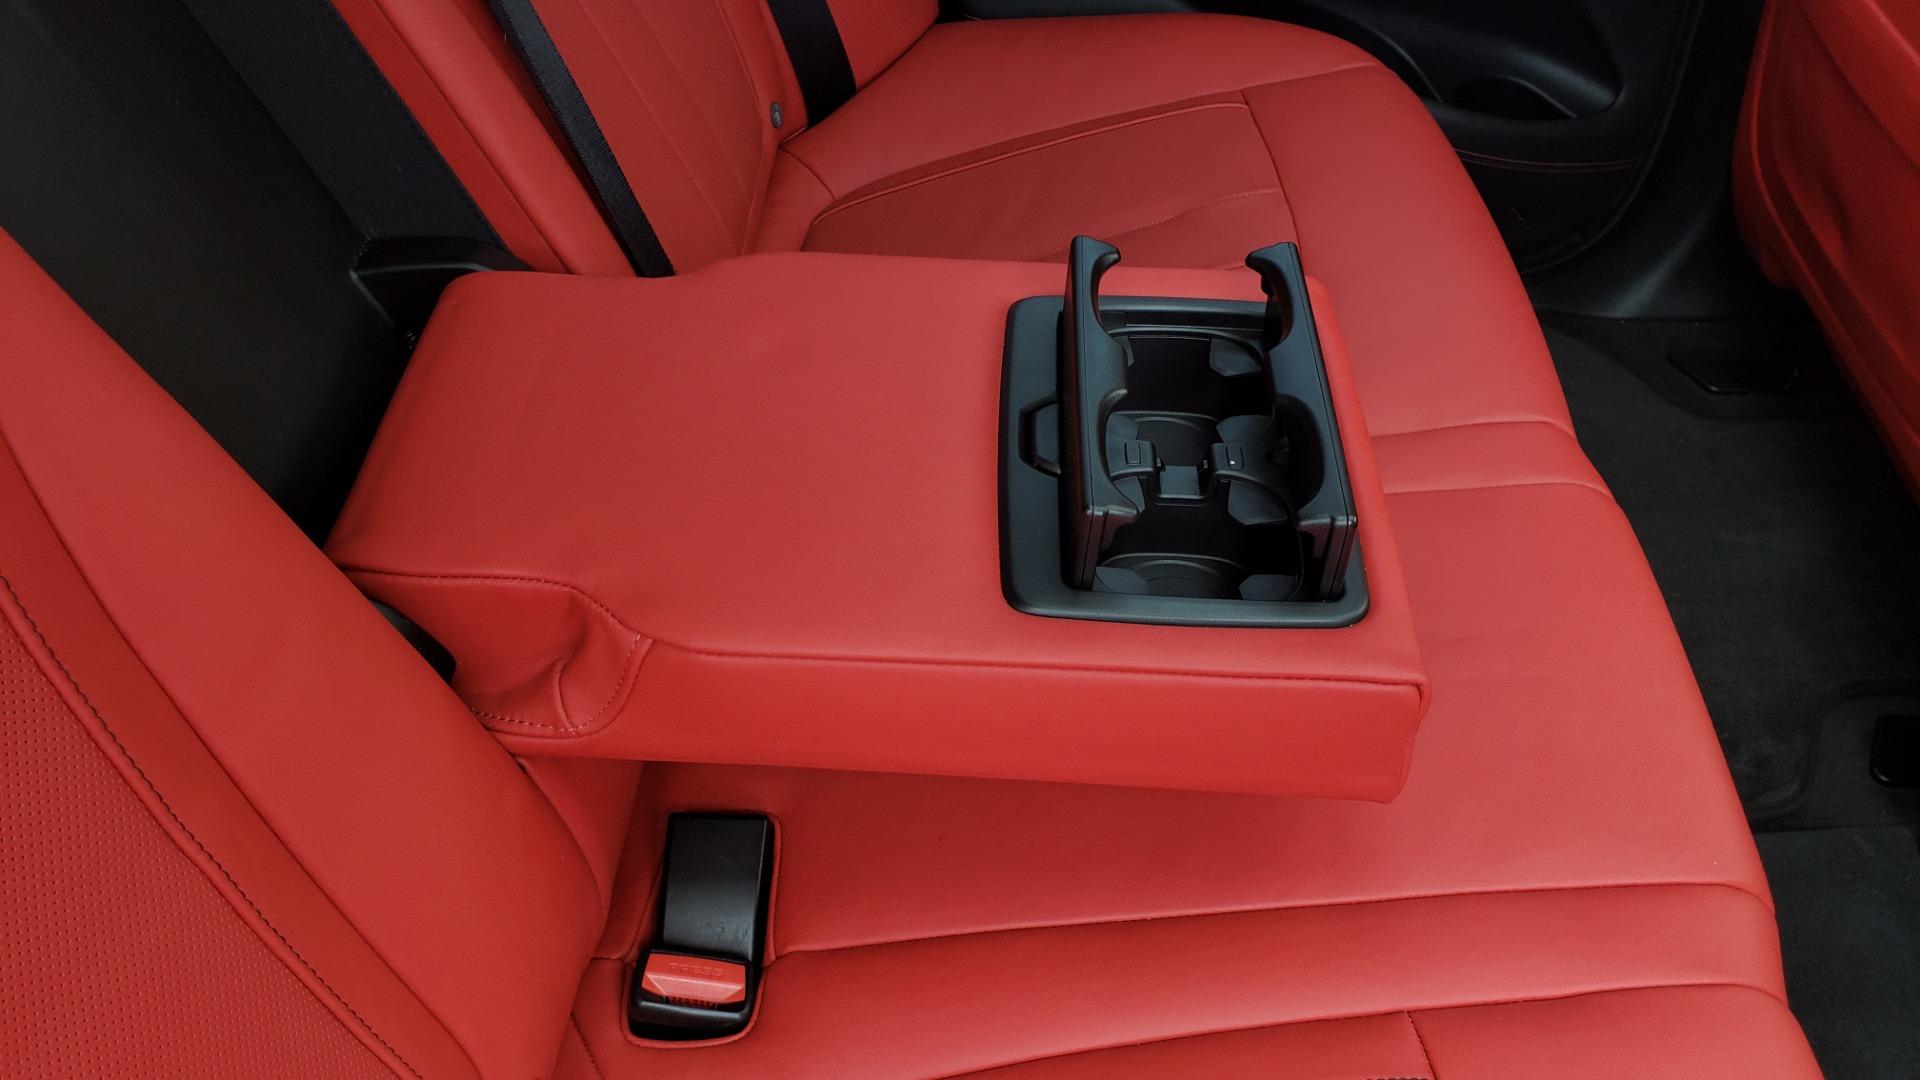 Used 2017 BMW X5 M EXECUTIVE PKG / NAV / DRVR ASST / BSM / HUD / HTD STS / WIFI for sale Sold at Formula Imports in Charlotte NC 28227 78